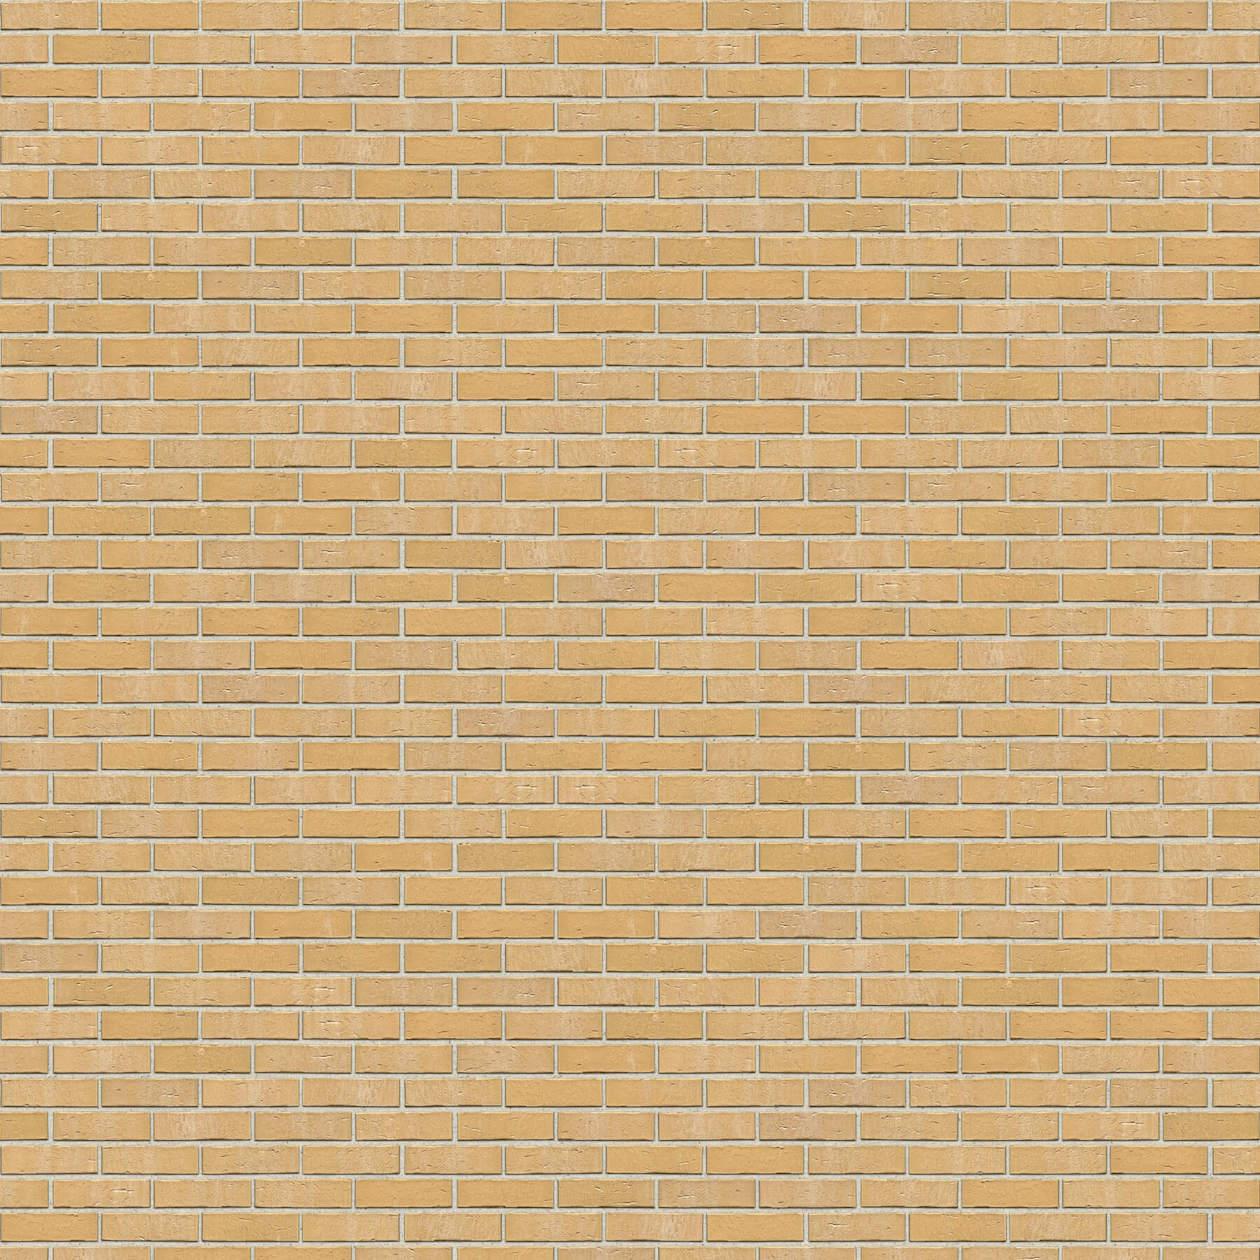 Puna-cigla-FeldHaus-Klinker-brick-house-nf-k-762-Bela Fuga